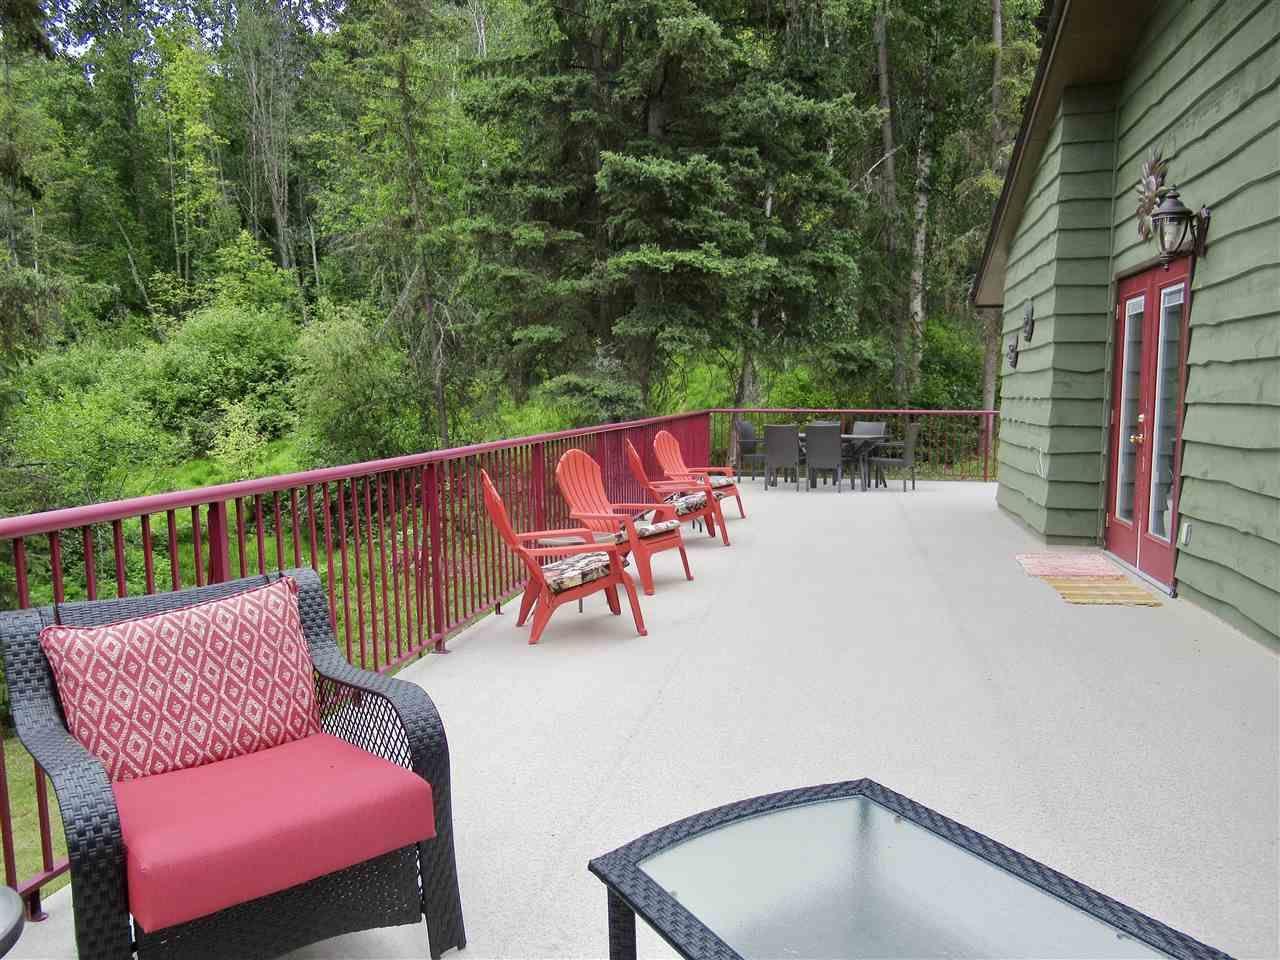 Photo 16: Photos: 911 CENTAUR Drive in Williams Lake: Esler/Dog Creek House for sale (Williams Lake (Zone 27))  : MLS®# R2378444